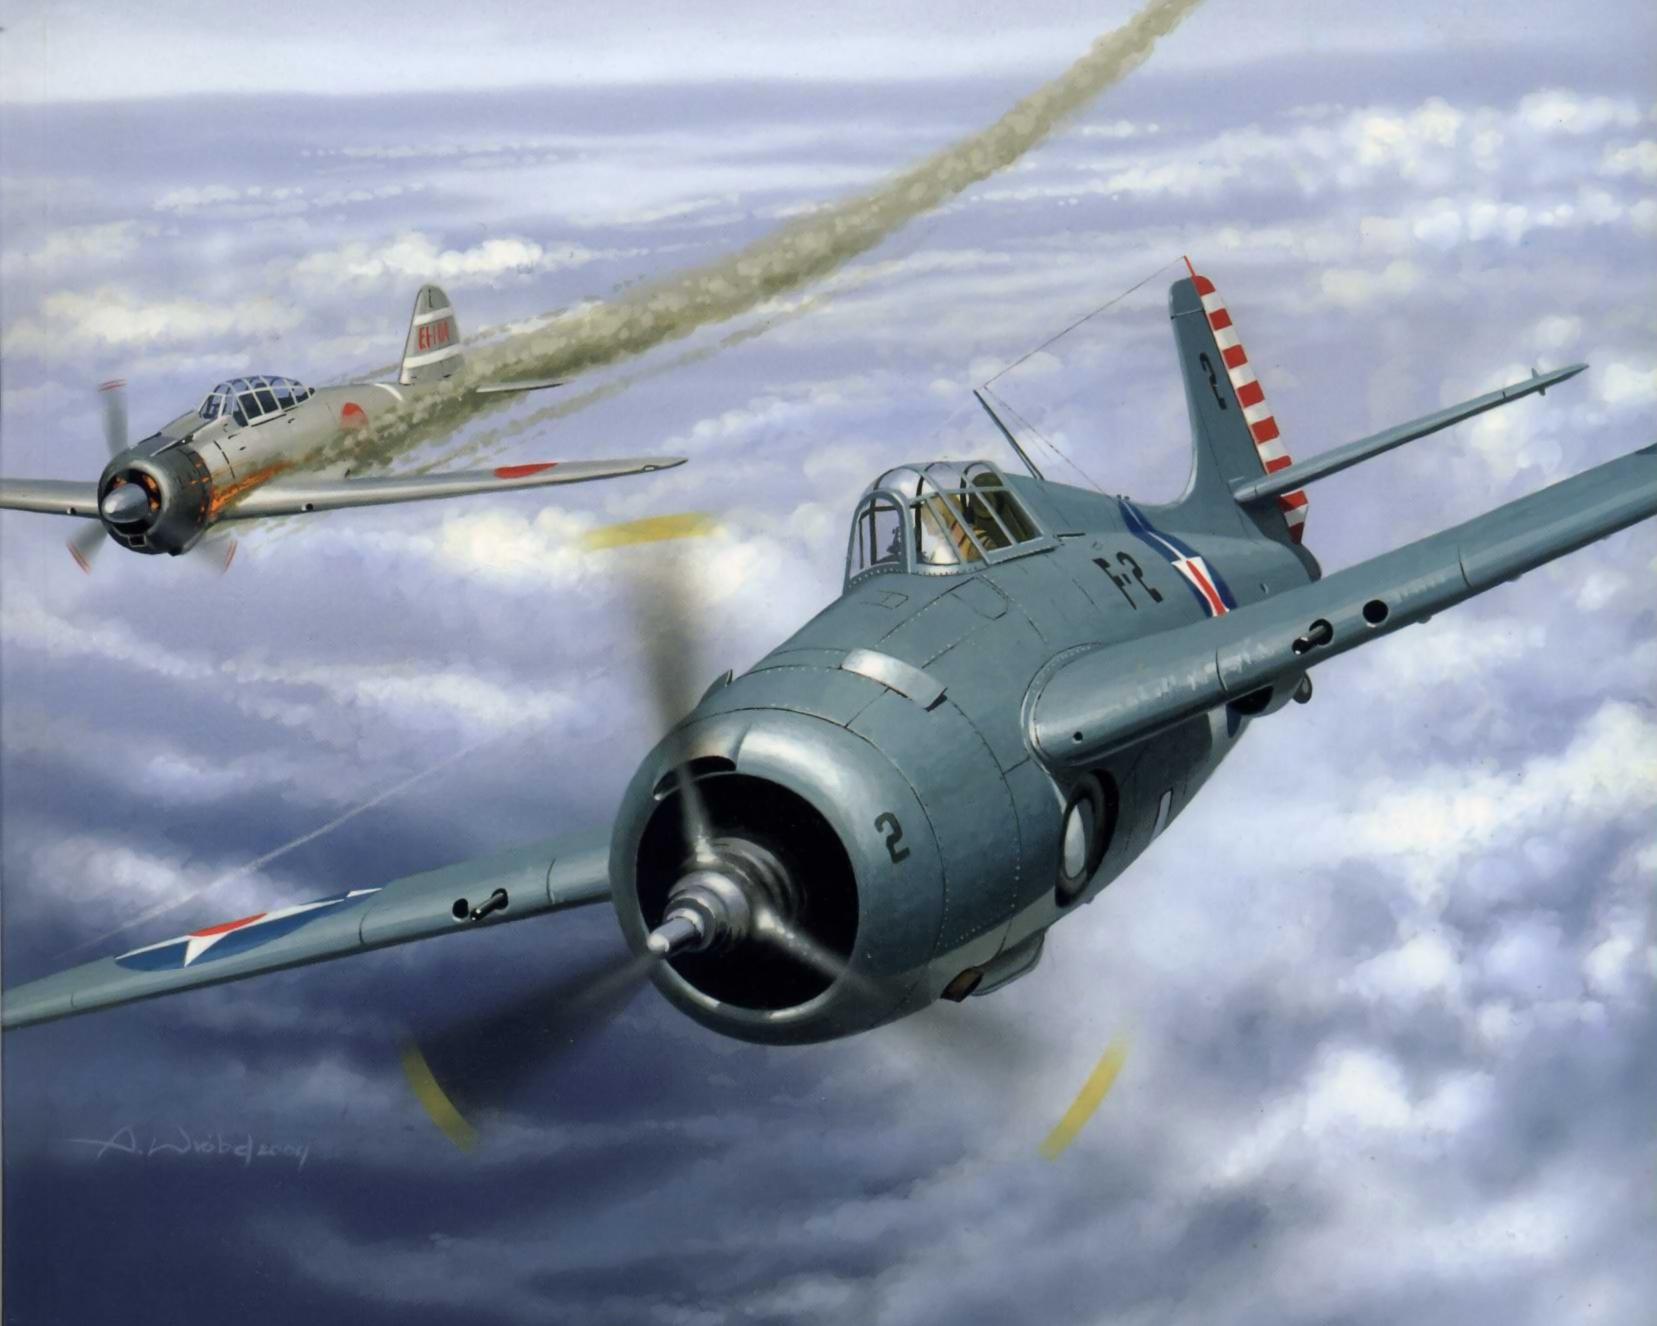 Wróbel Arkadiusz. Истребитель Grumman F-4F Wildcat.